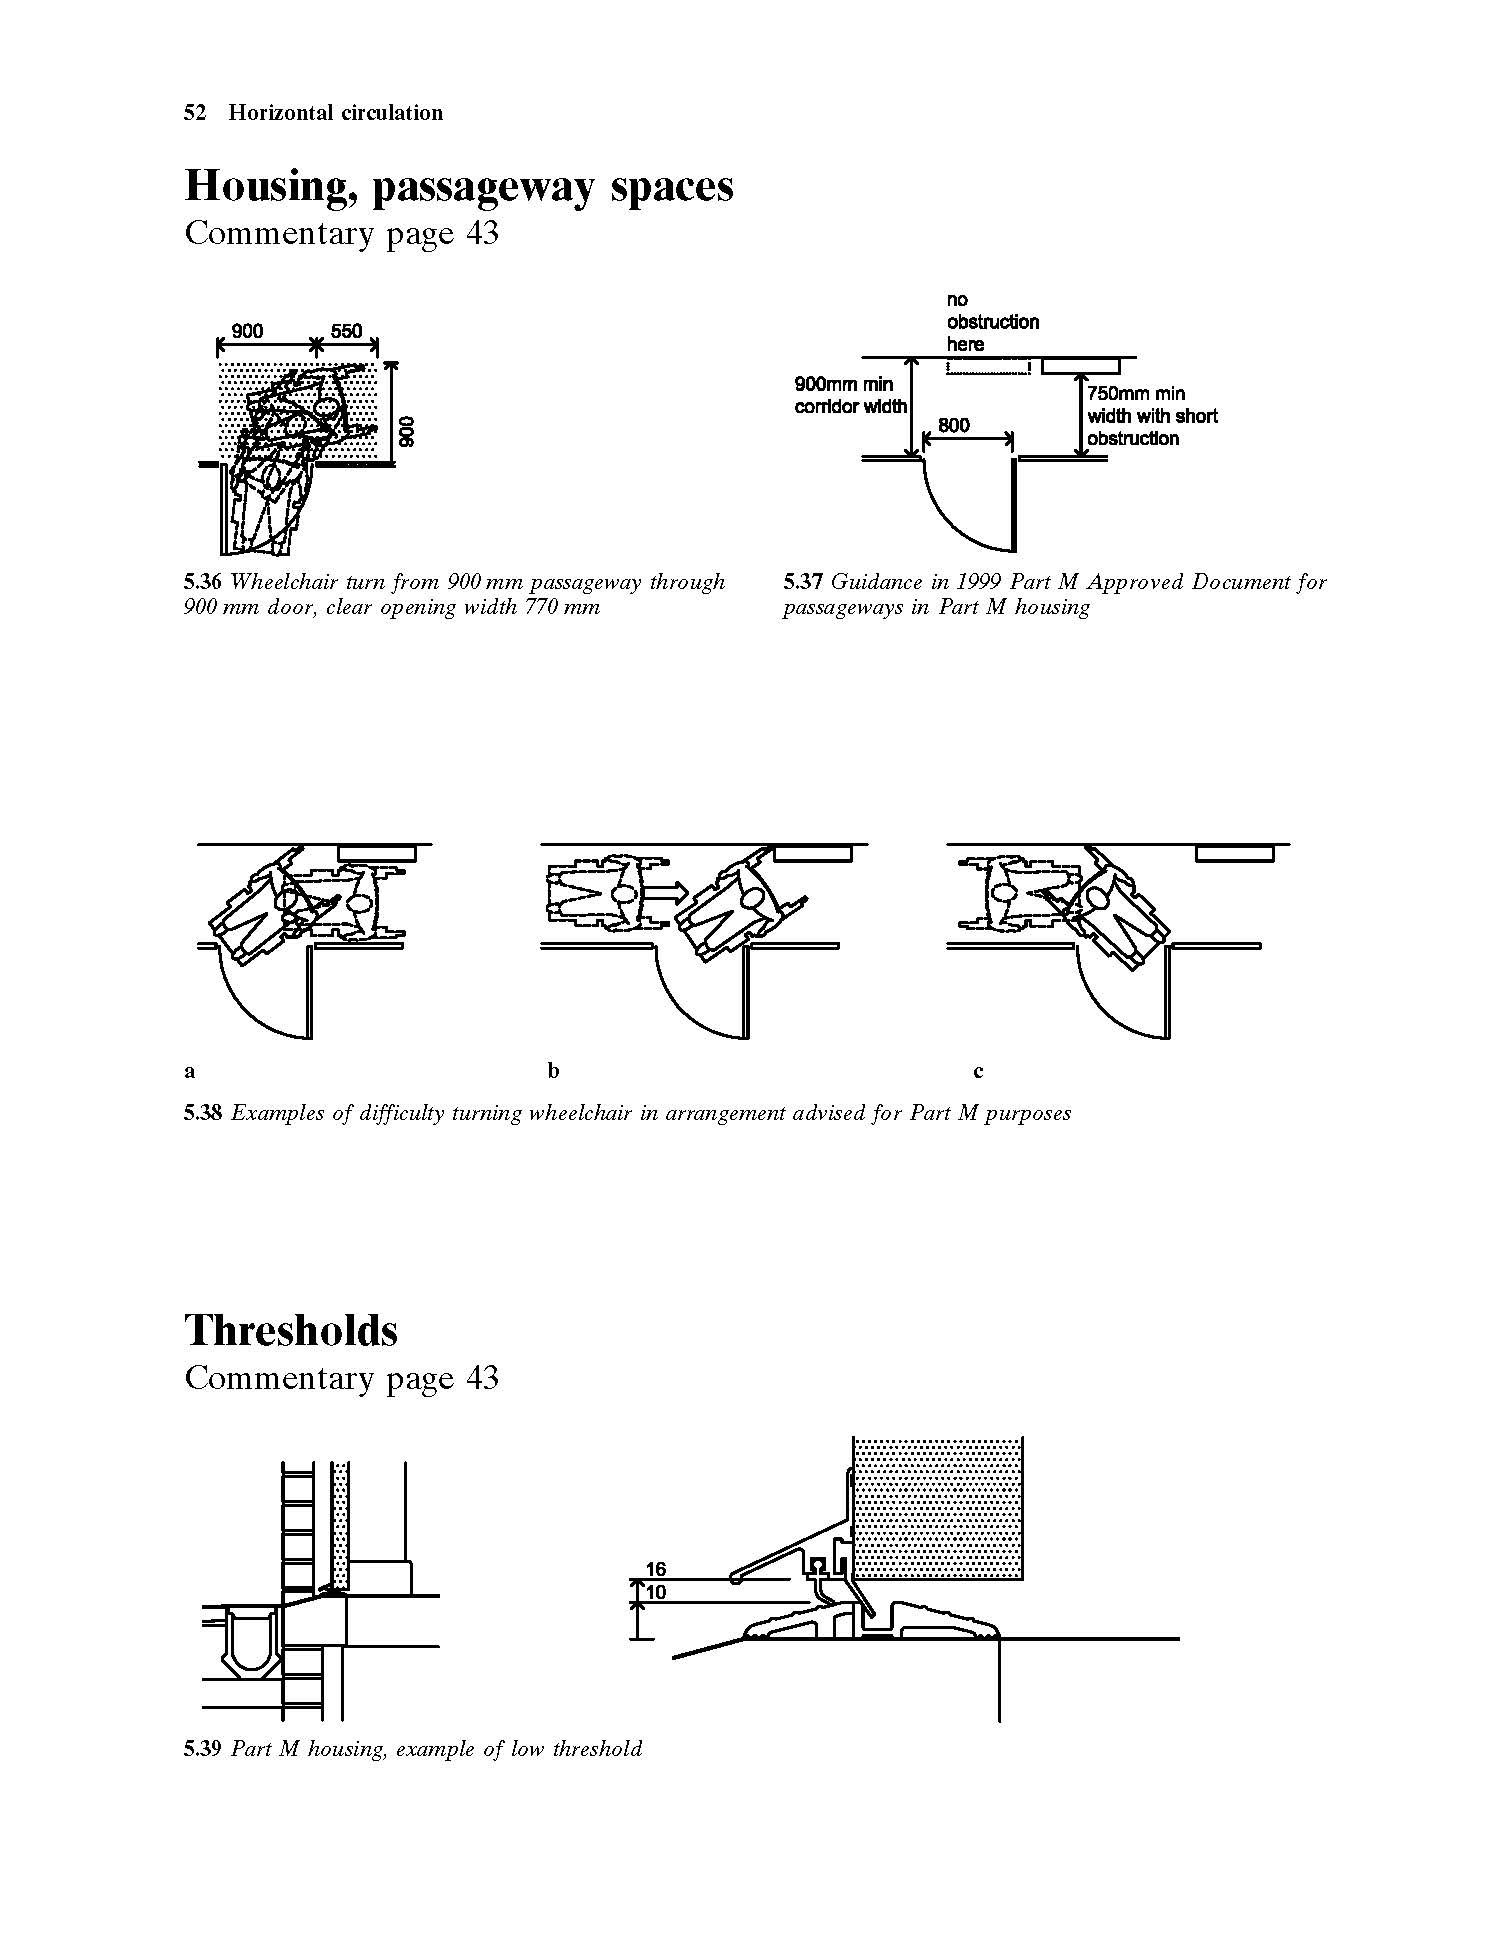 universal design design basics concept diagram toilet flush toilet toilets powder [ 1490 x 1941 Pixel ]